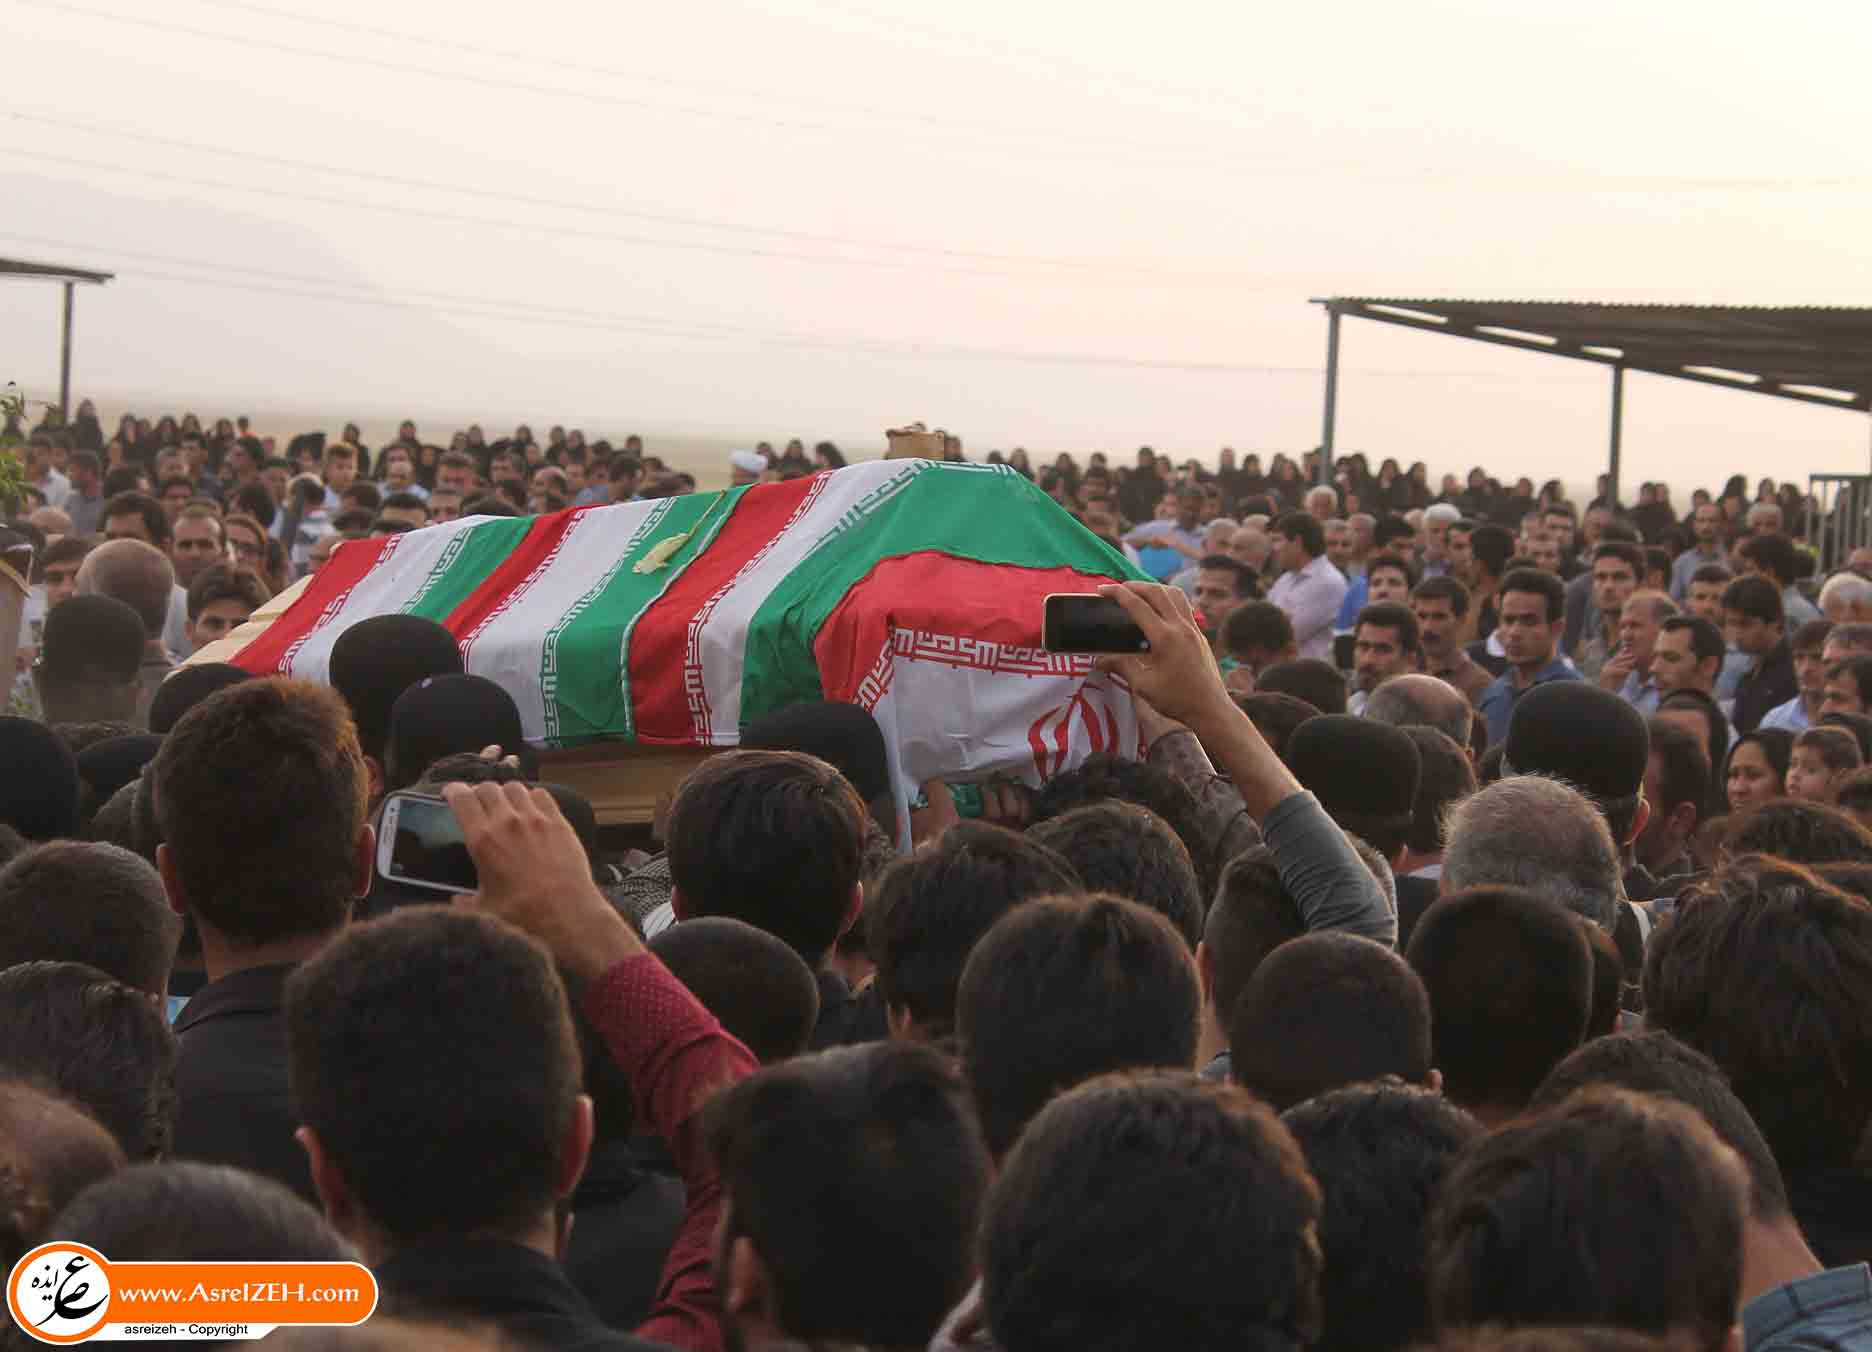 گزارش تصویری تشییع باشکوه پیکر شهرام محمدی